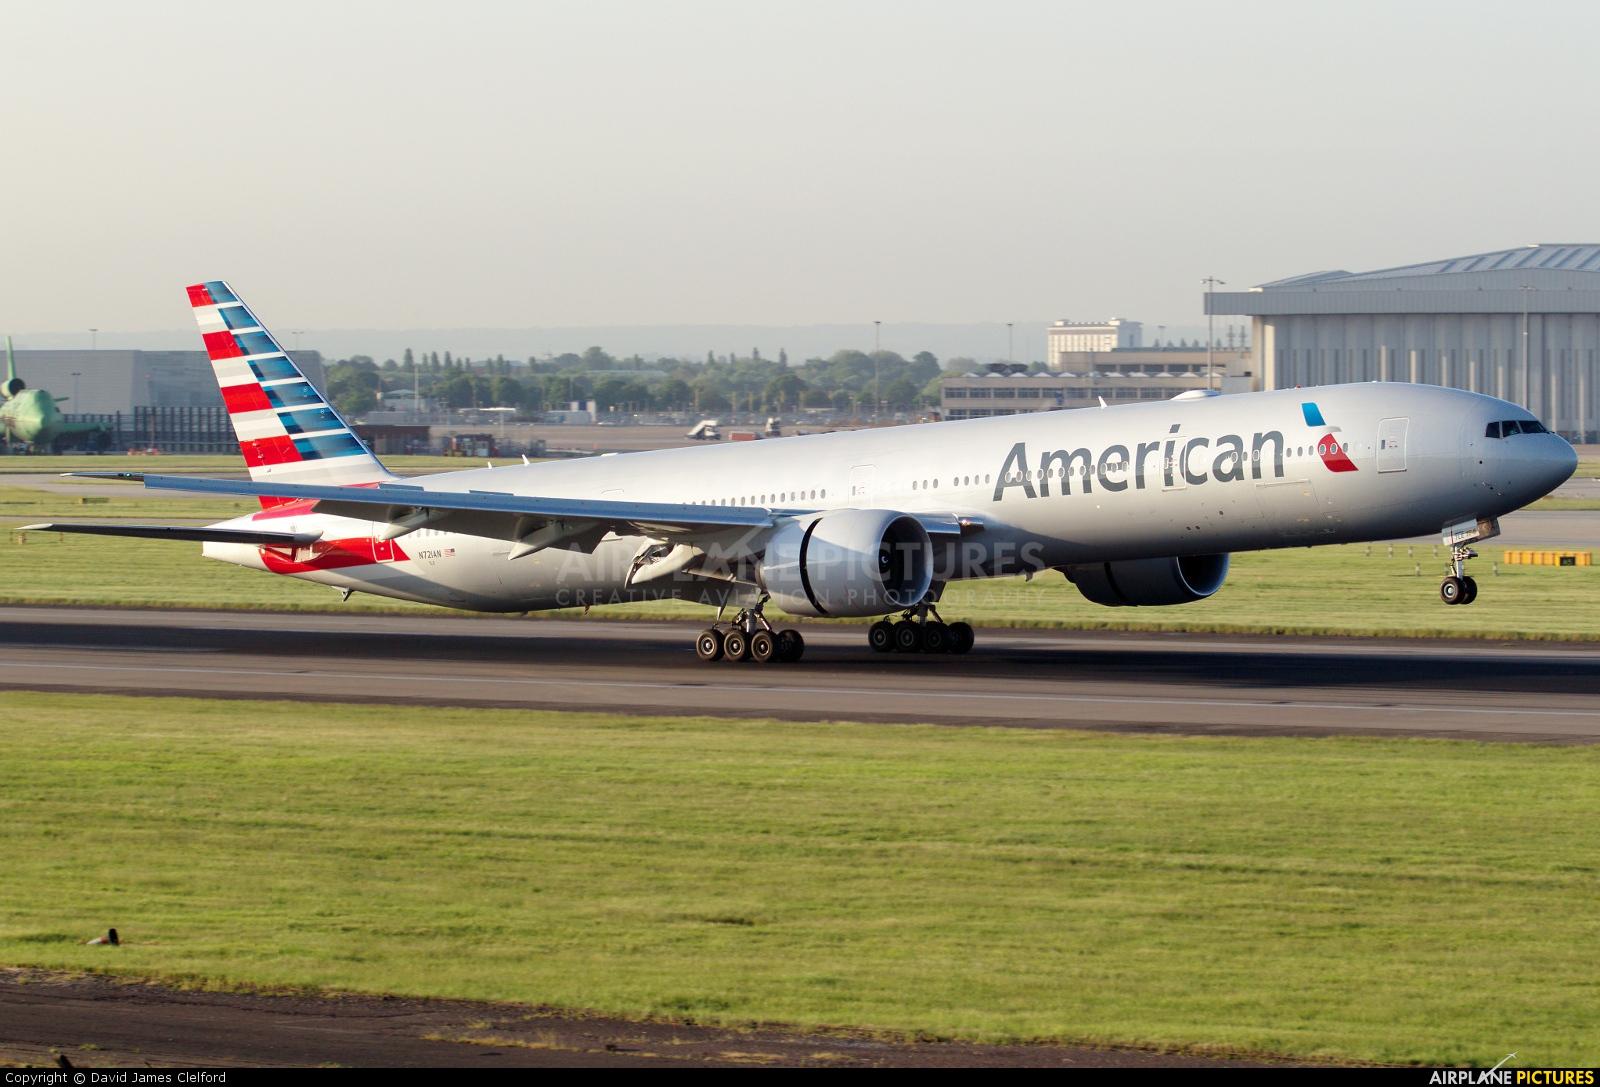 American Airlines N721AN aircraft at London - Heathrow